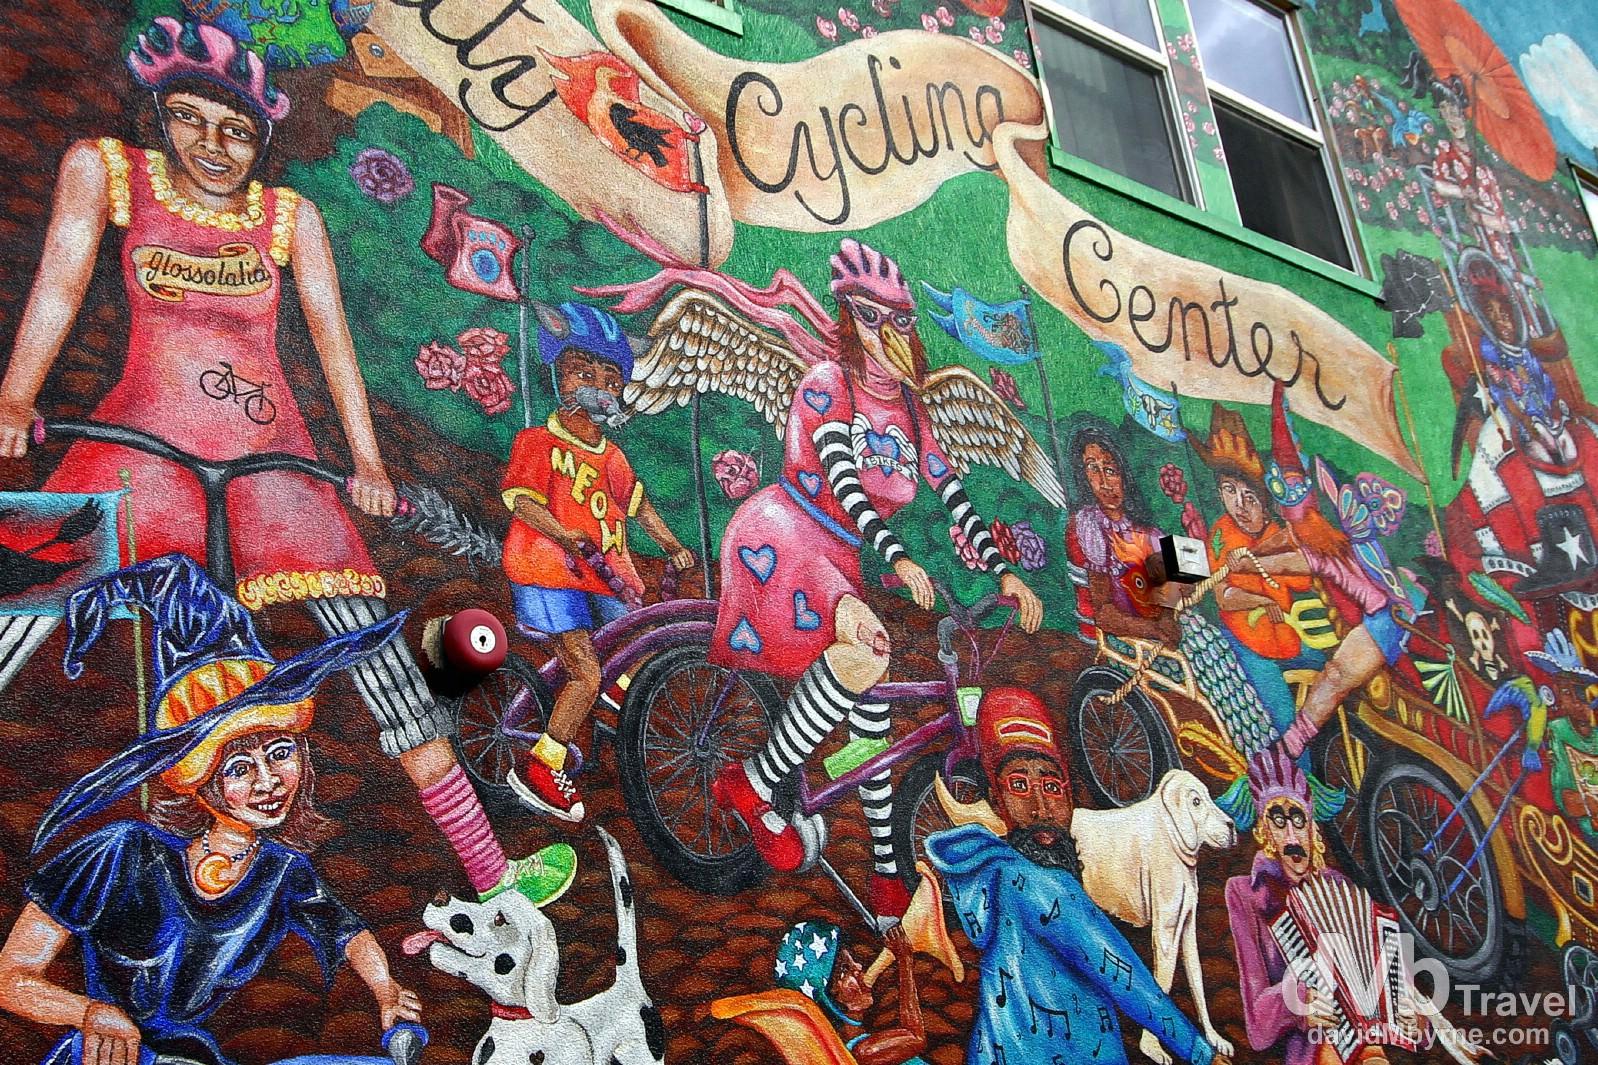 Murals on Alberta street in the Alberta Arts District in Portland, Oregon, USA. March 28, 2013.